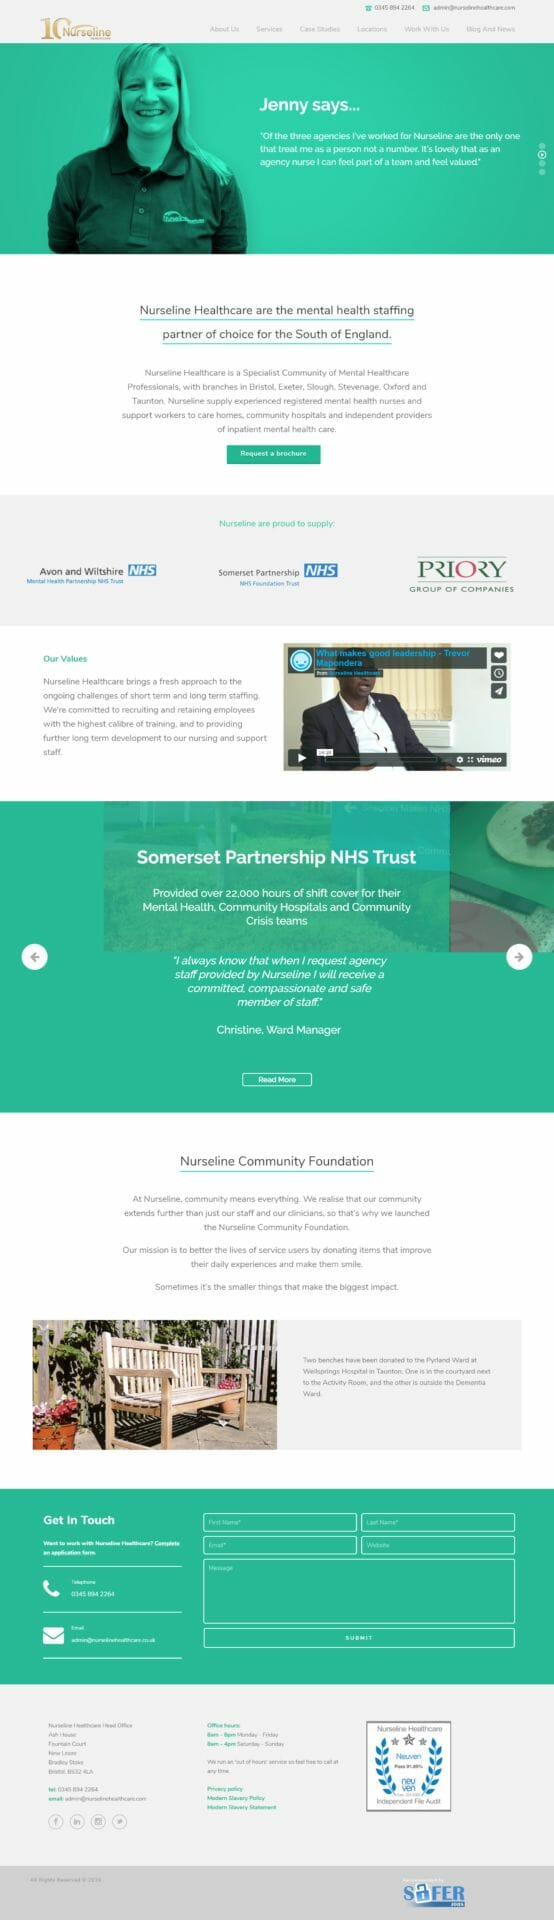 nurselinehealthcare.com